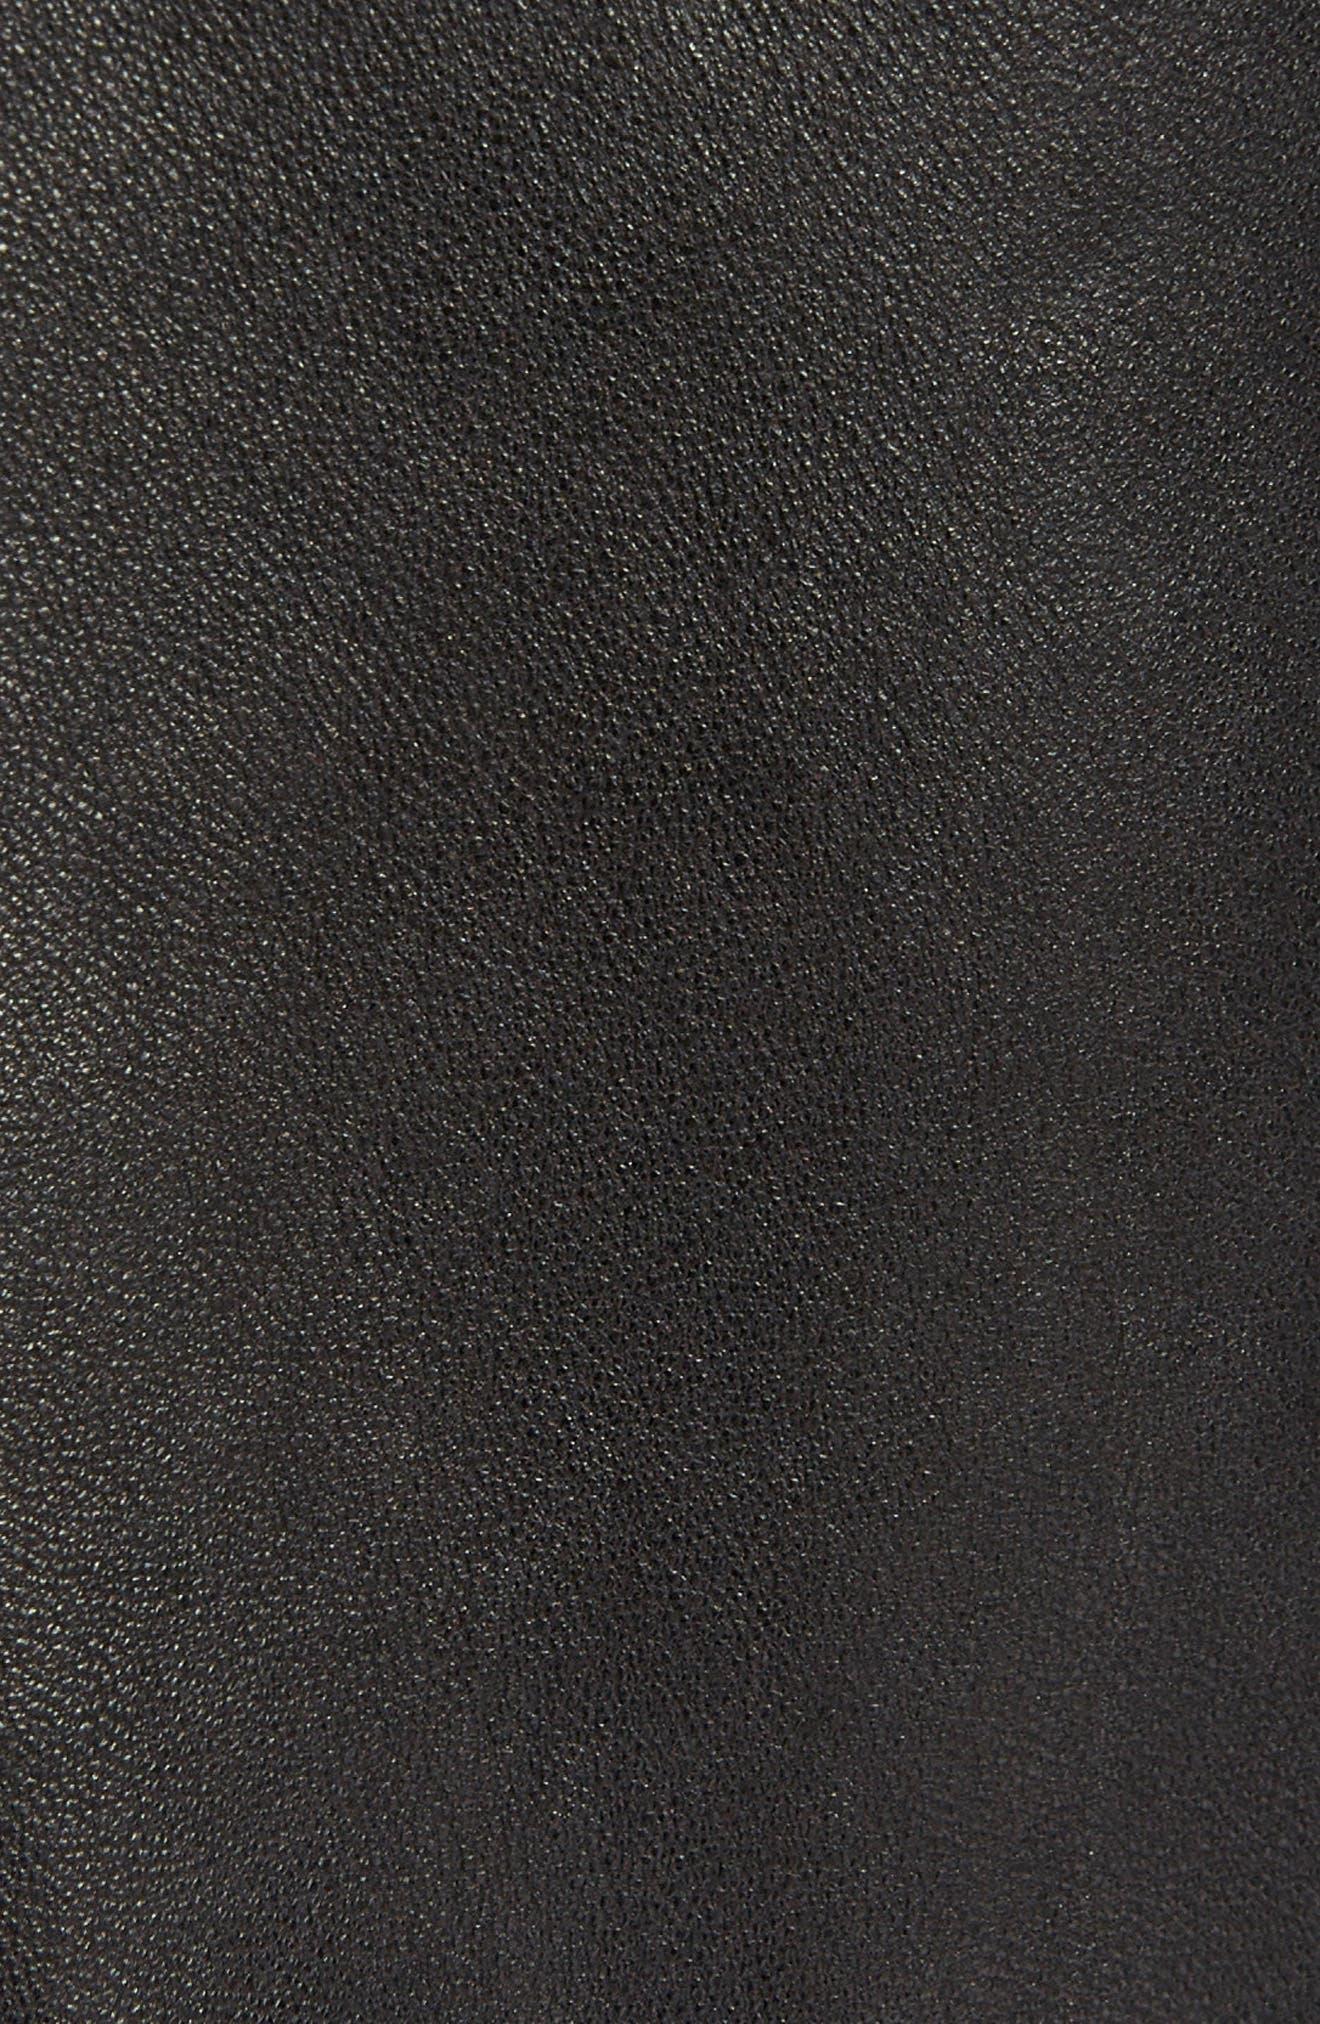 Isabel Marant Étoile Aya Leather Pants,                             Alternate thumbnail 5, color,                             BLACK